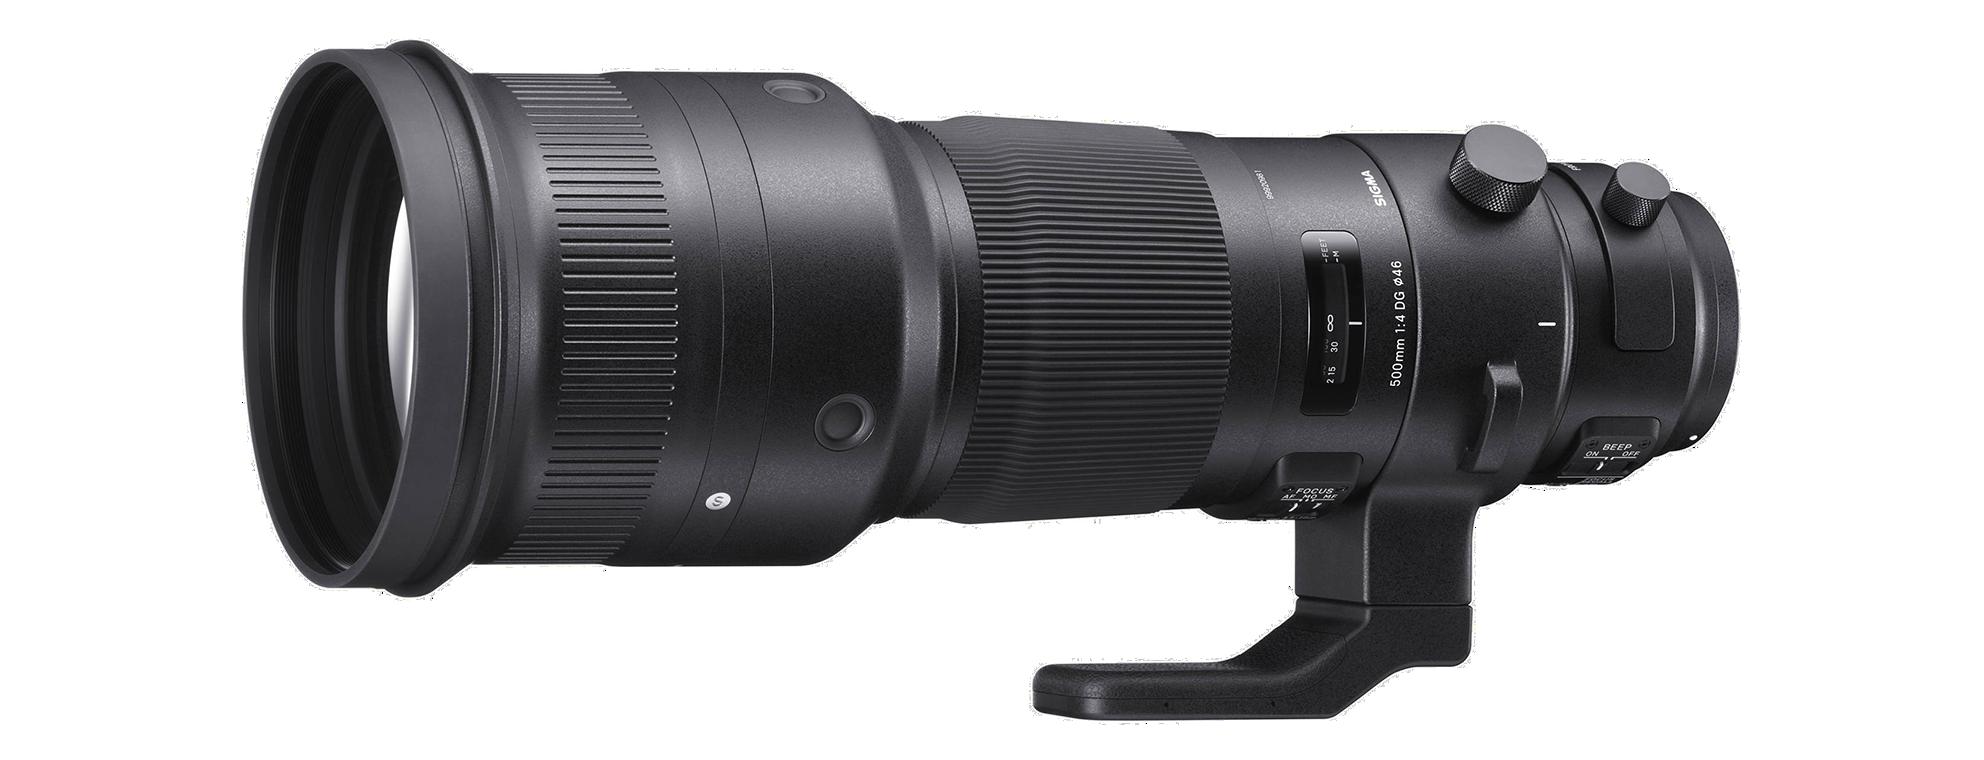 Sigma 500mm lens hire